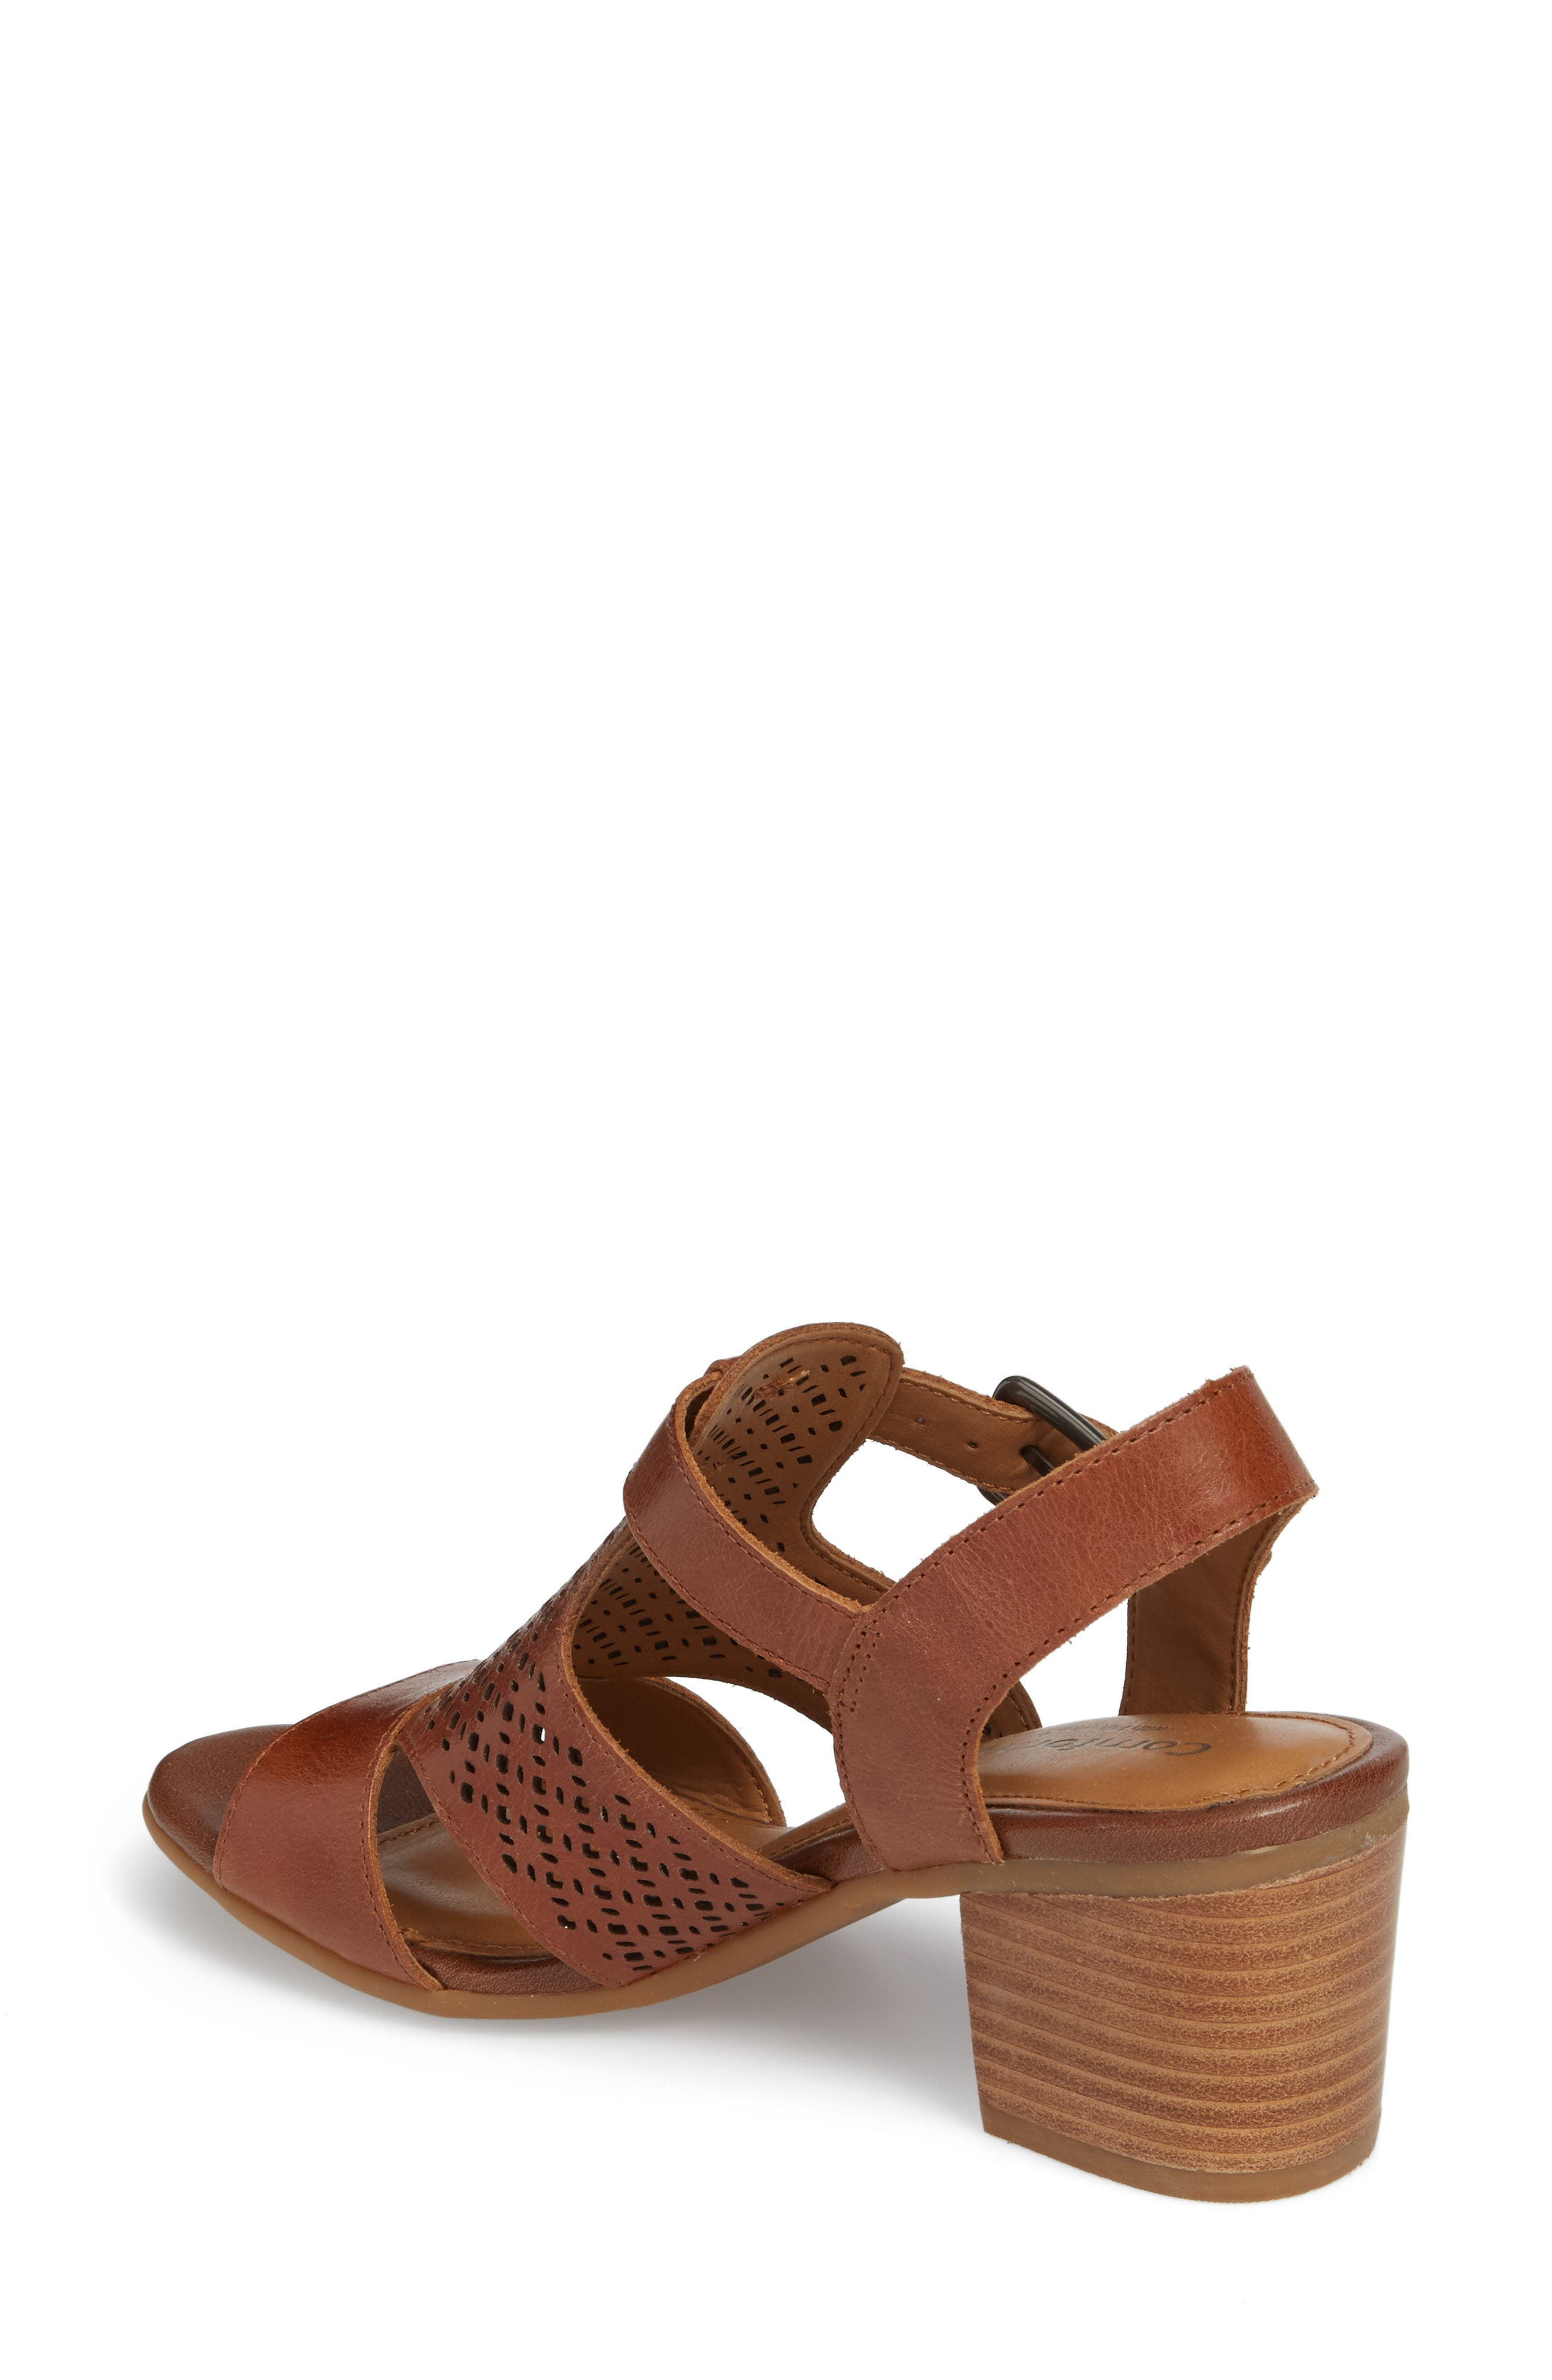 Amber Perforated Block Heel Sandal,                             Alternate thumbnail 2, color,                             Luggage Leather